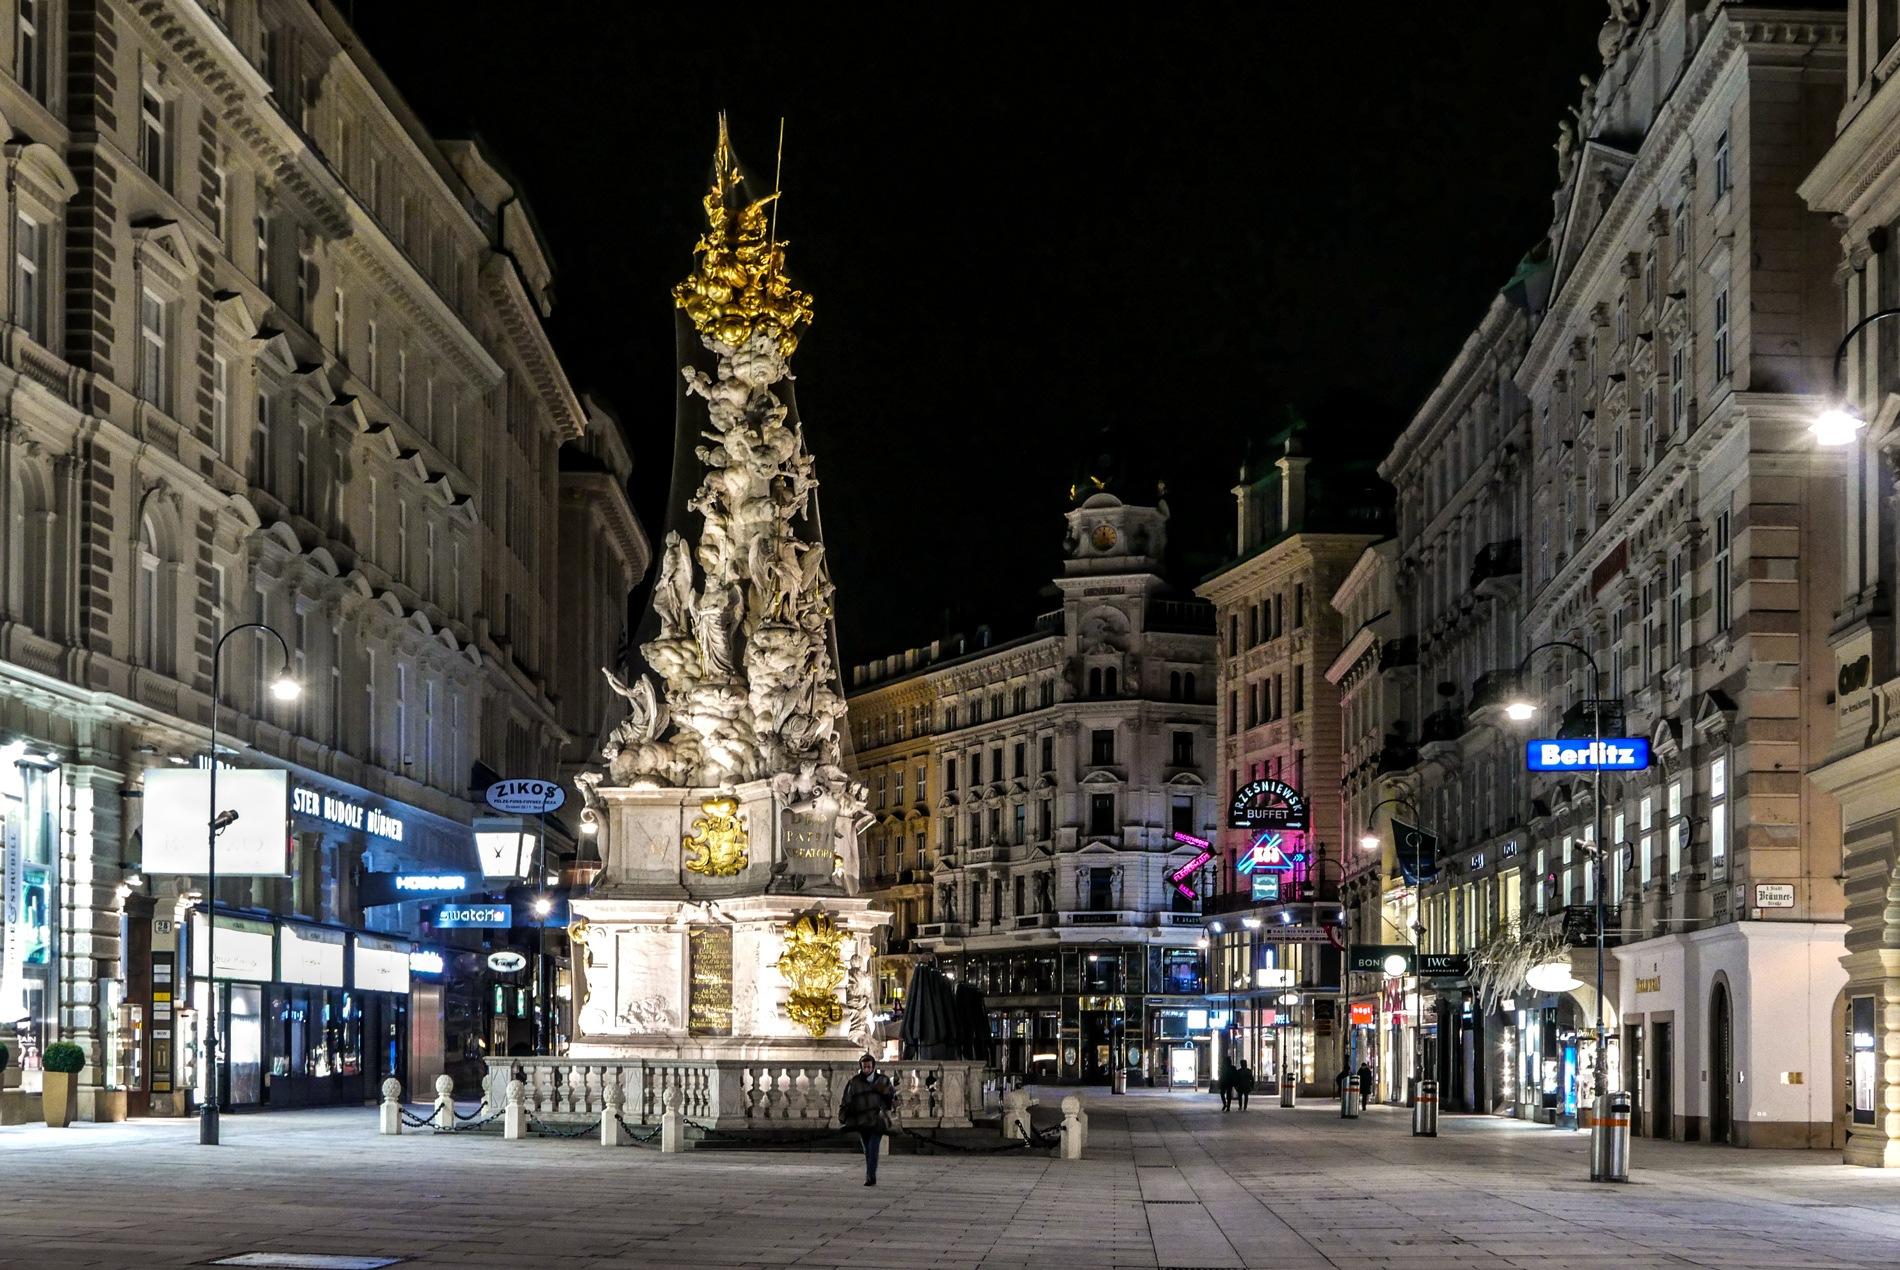 Plague column, Vienna by Chris Panagiotidis